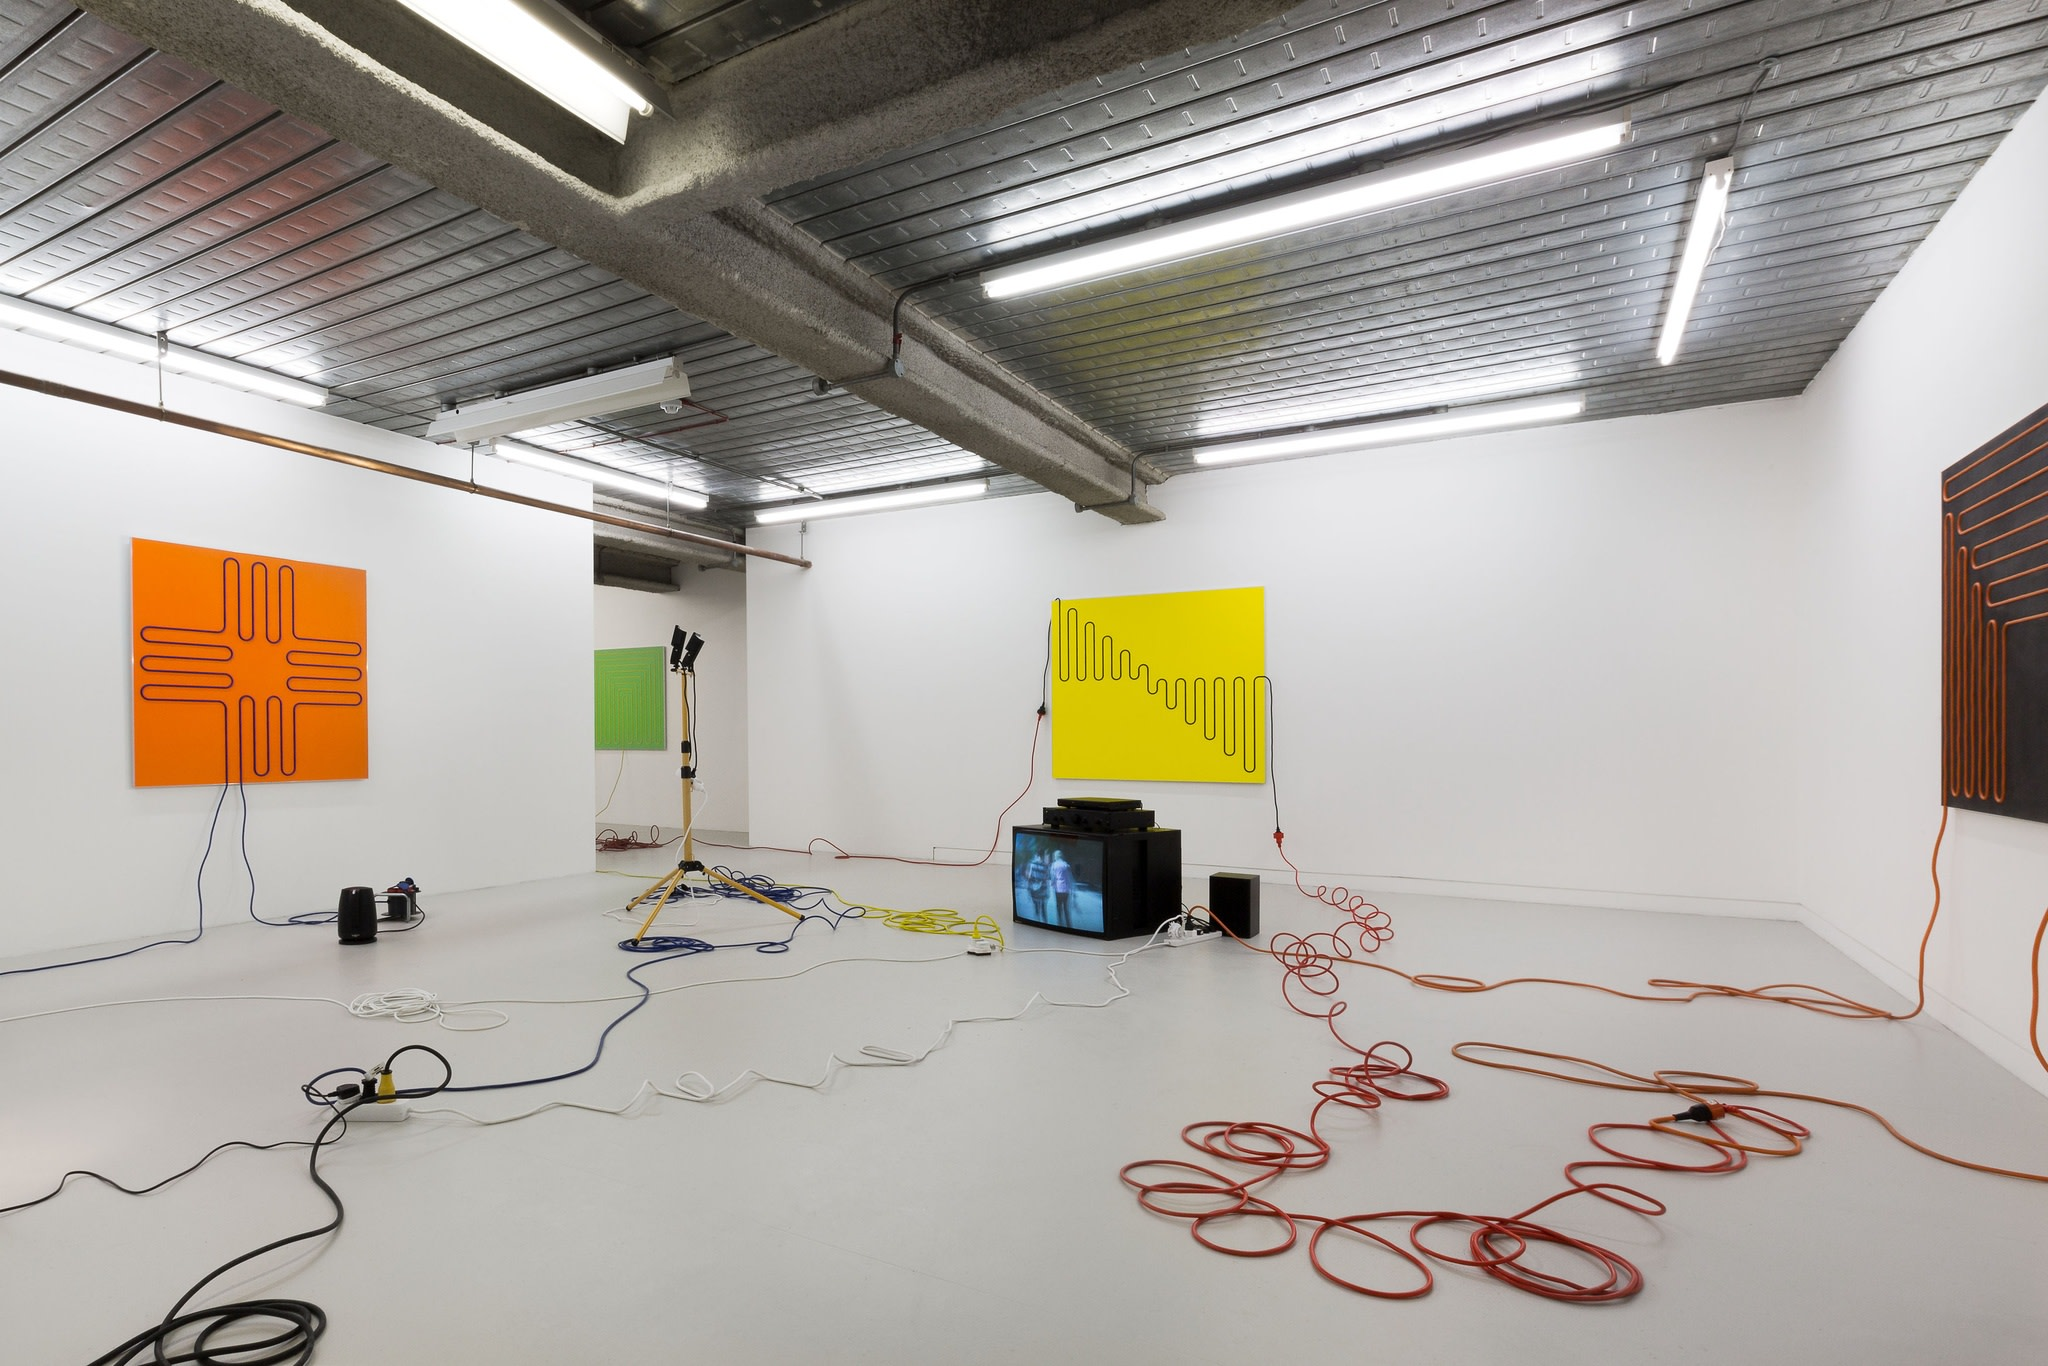 <span class=&#34;link fancybox-details-link&#34;><a href=&#34;/artists/44-jacob-dahlgren/works/8822/&#34;>View Detail Page</a></span><div class=&#34;artist&#34;><strong>Jacob Dahlgren</strong></div> <div class=&#34;title&#34;><em>Third Uncle</em>, 2015</div> <div class=&#34;medium&#34;>Workplace London</div> <div class=&#34;dimensions&#34;>27 February - 25 April 2015</div><div class=&#34;copyright_line&#34;>Copyright The Artist</div>